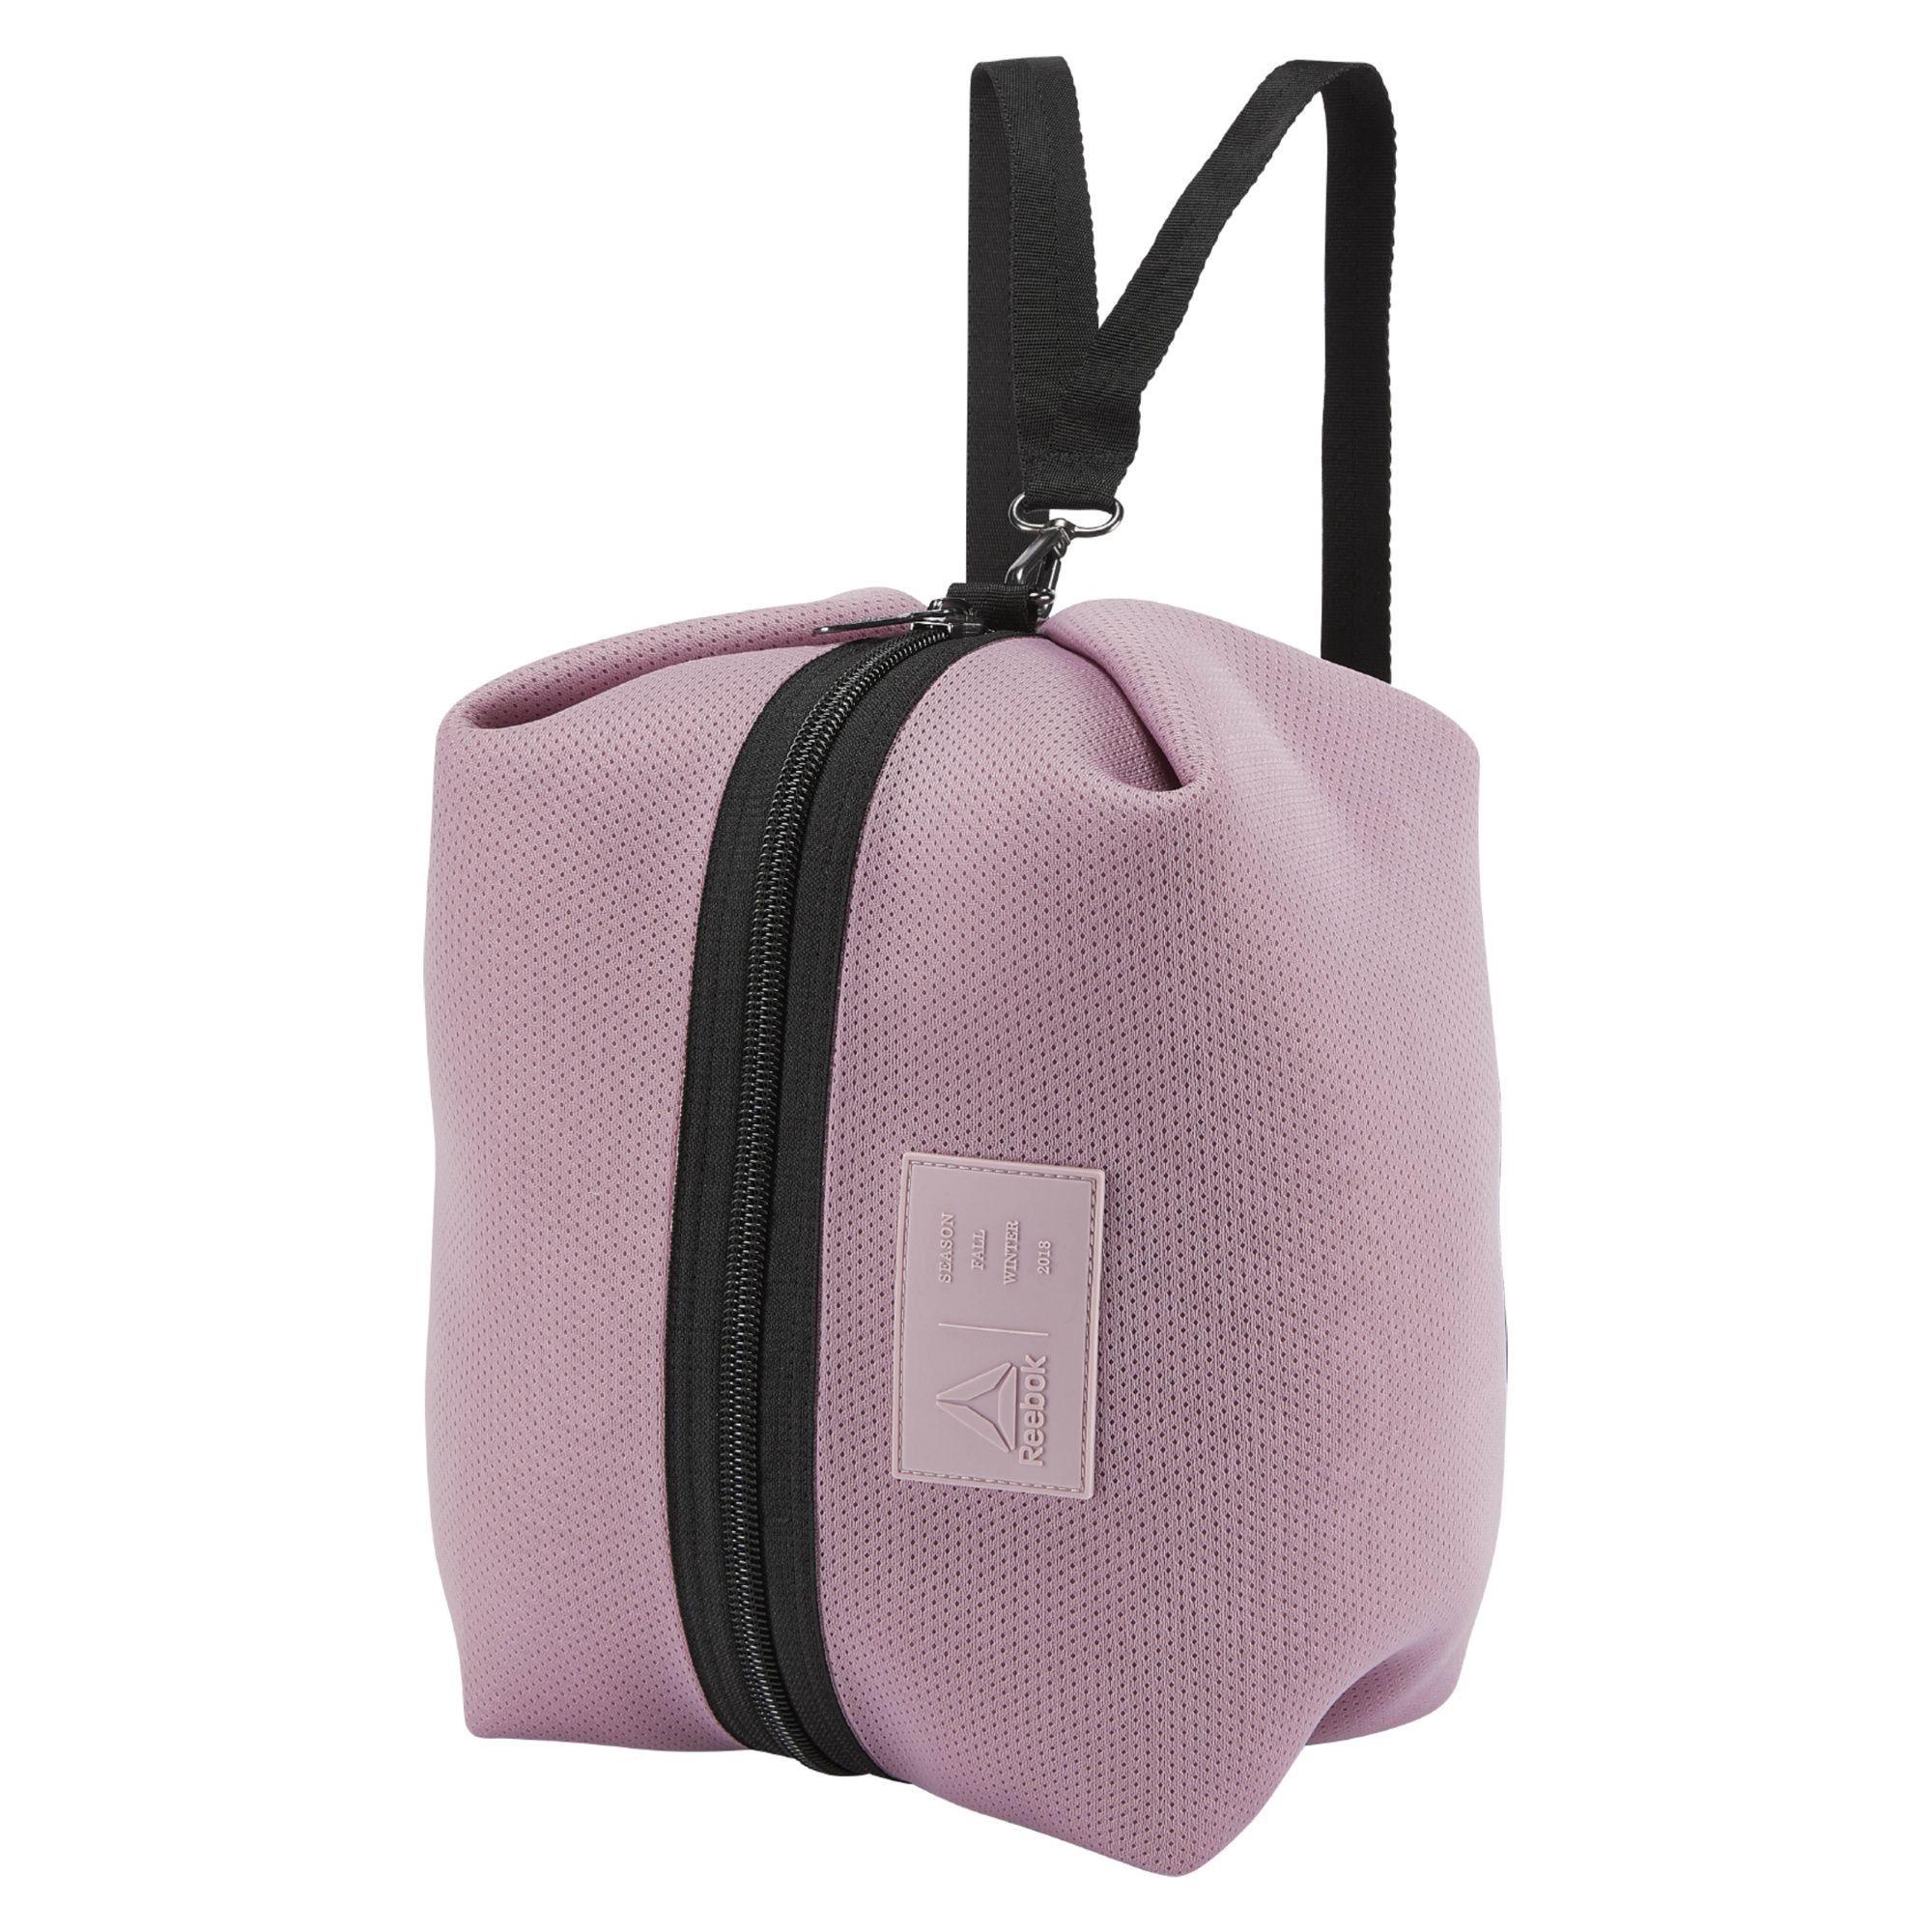 Reebok Imagiro Bag - Infused Lilac N Sz  8d9417945b75a